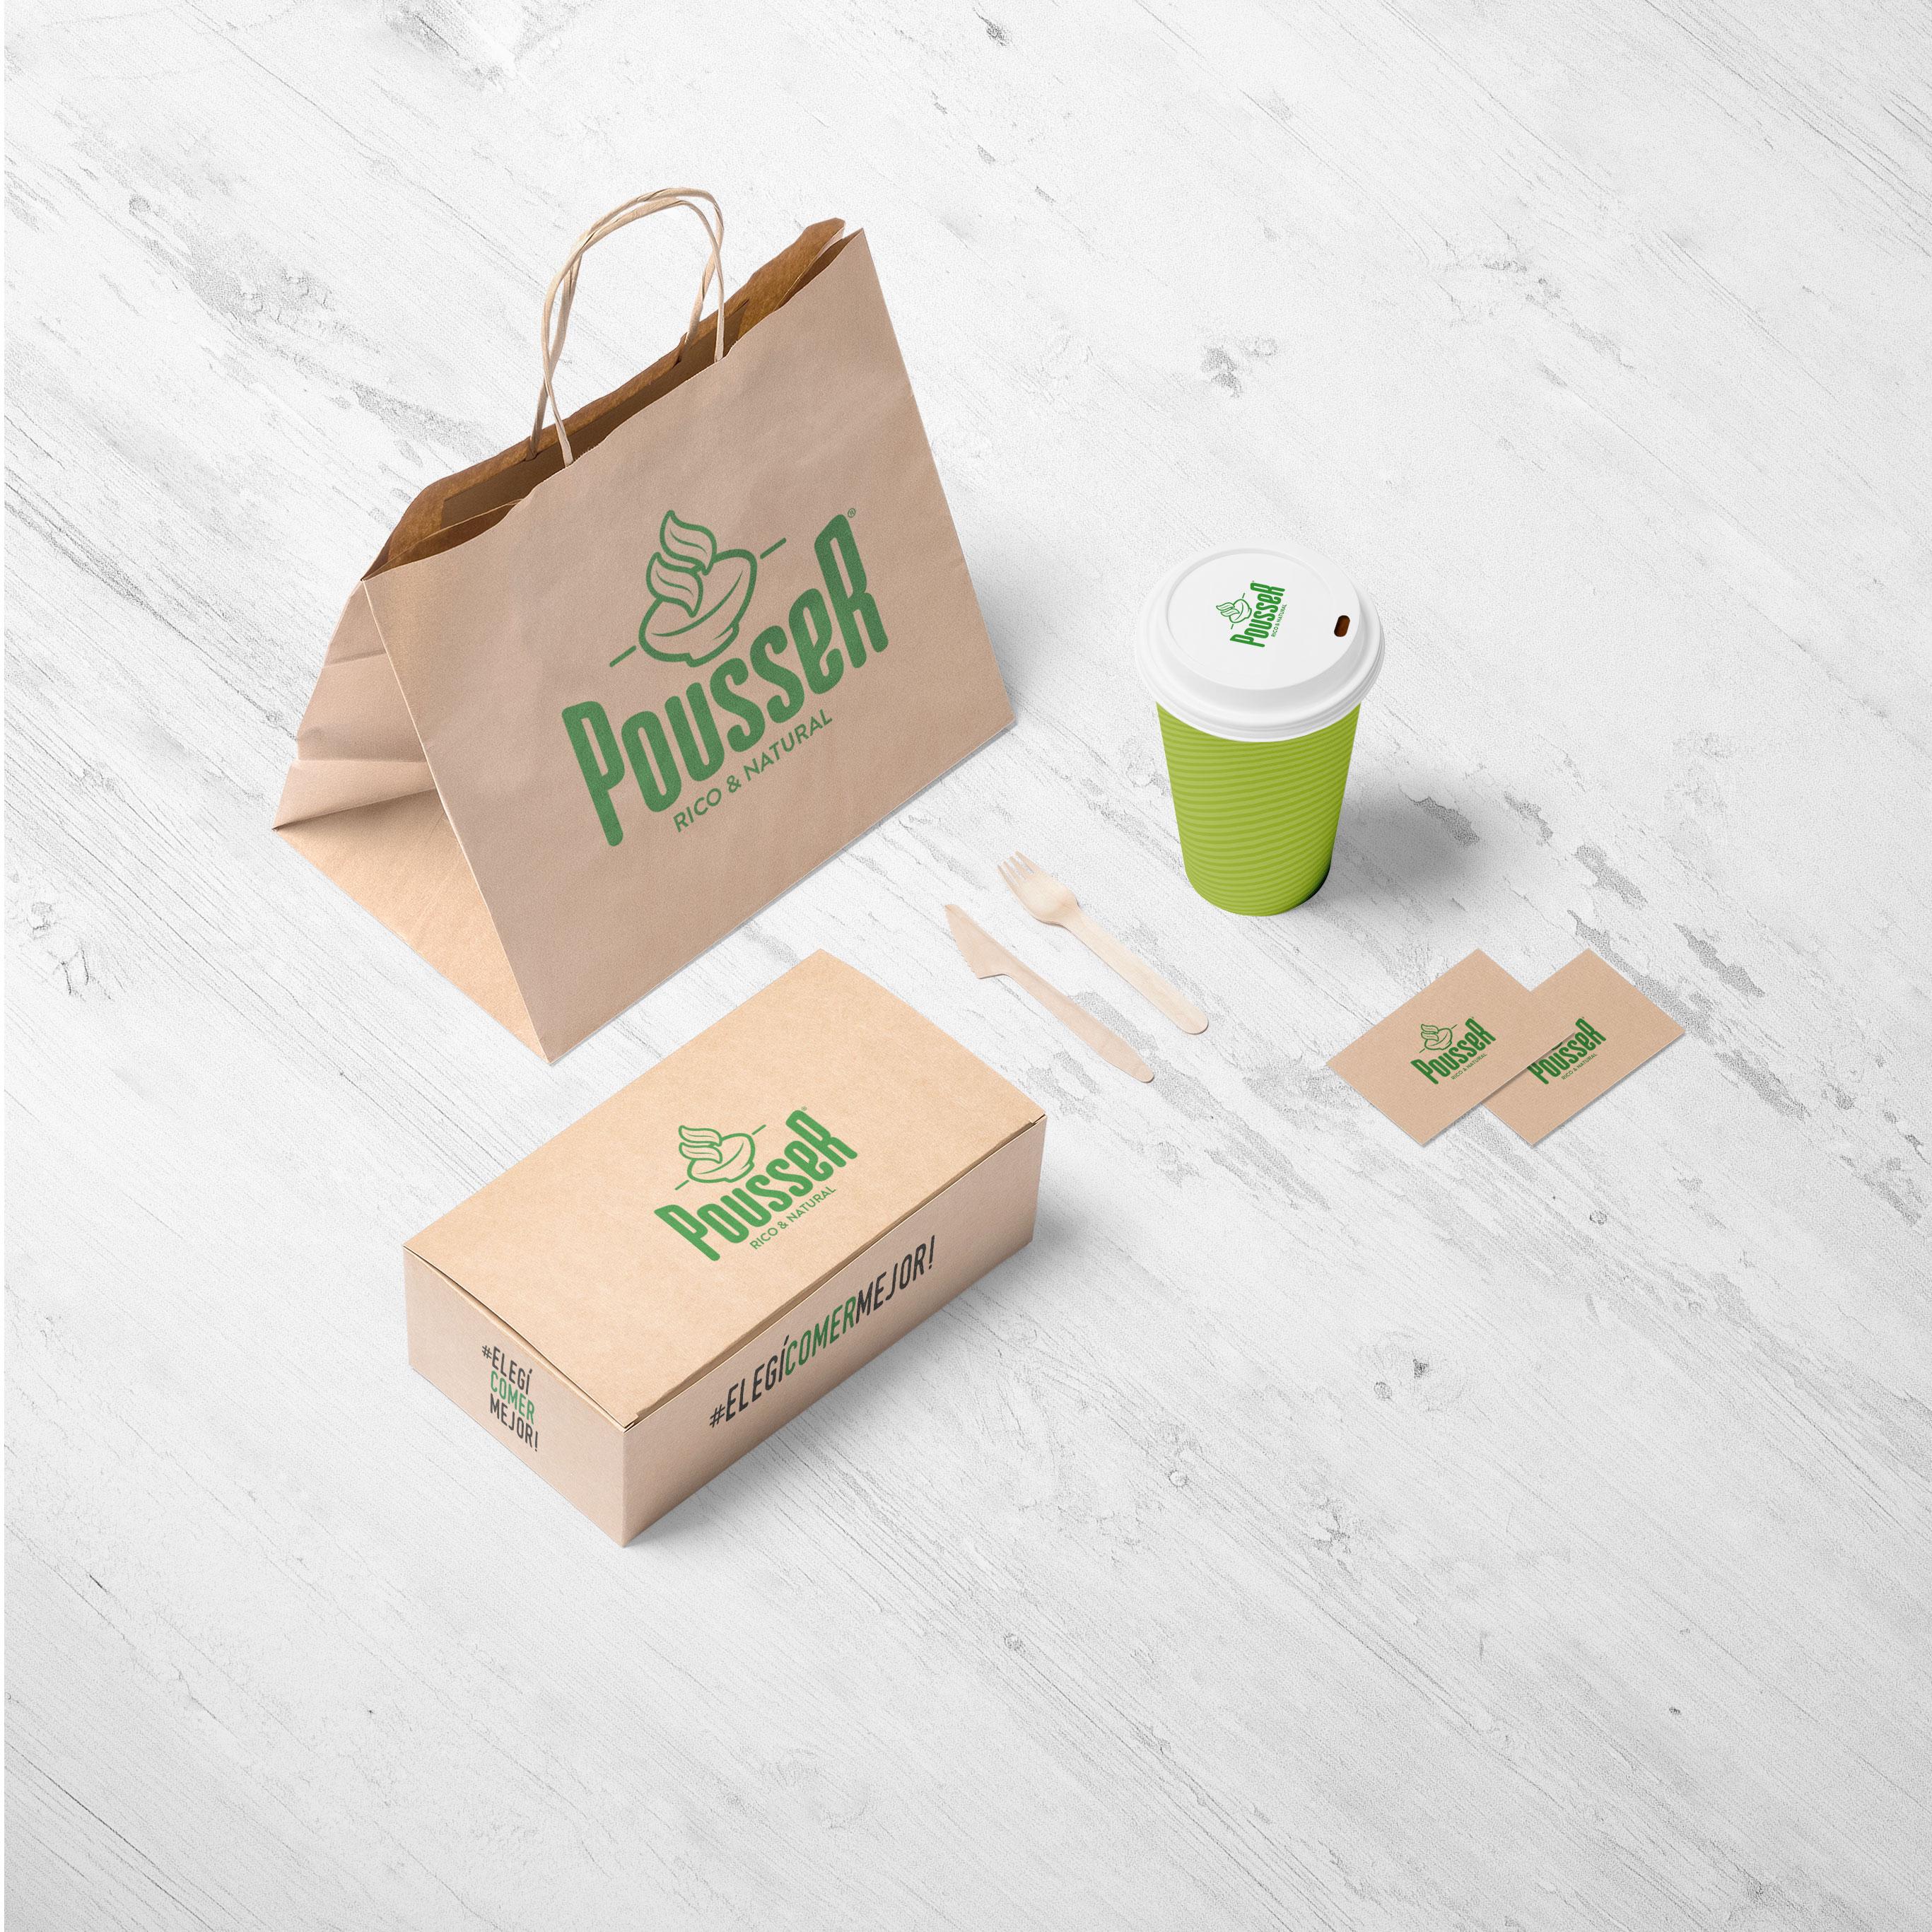 burger-store-free-mockup-by-mockupcloud